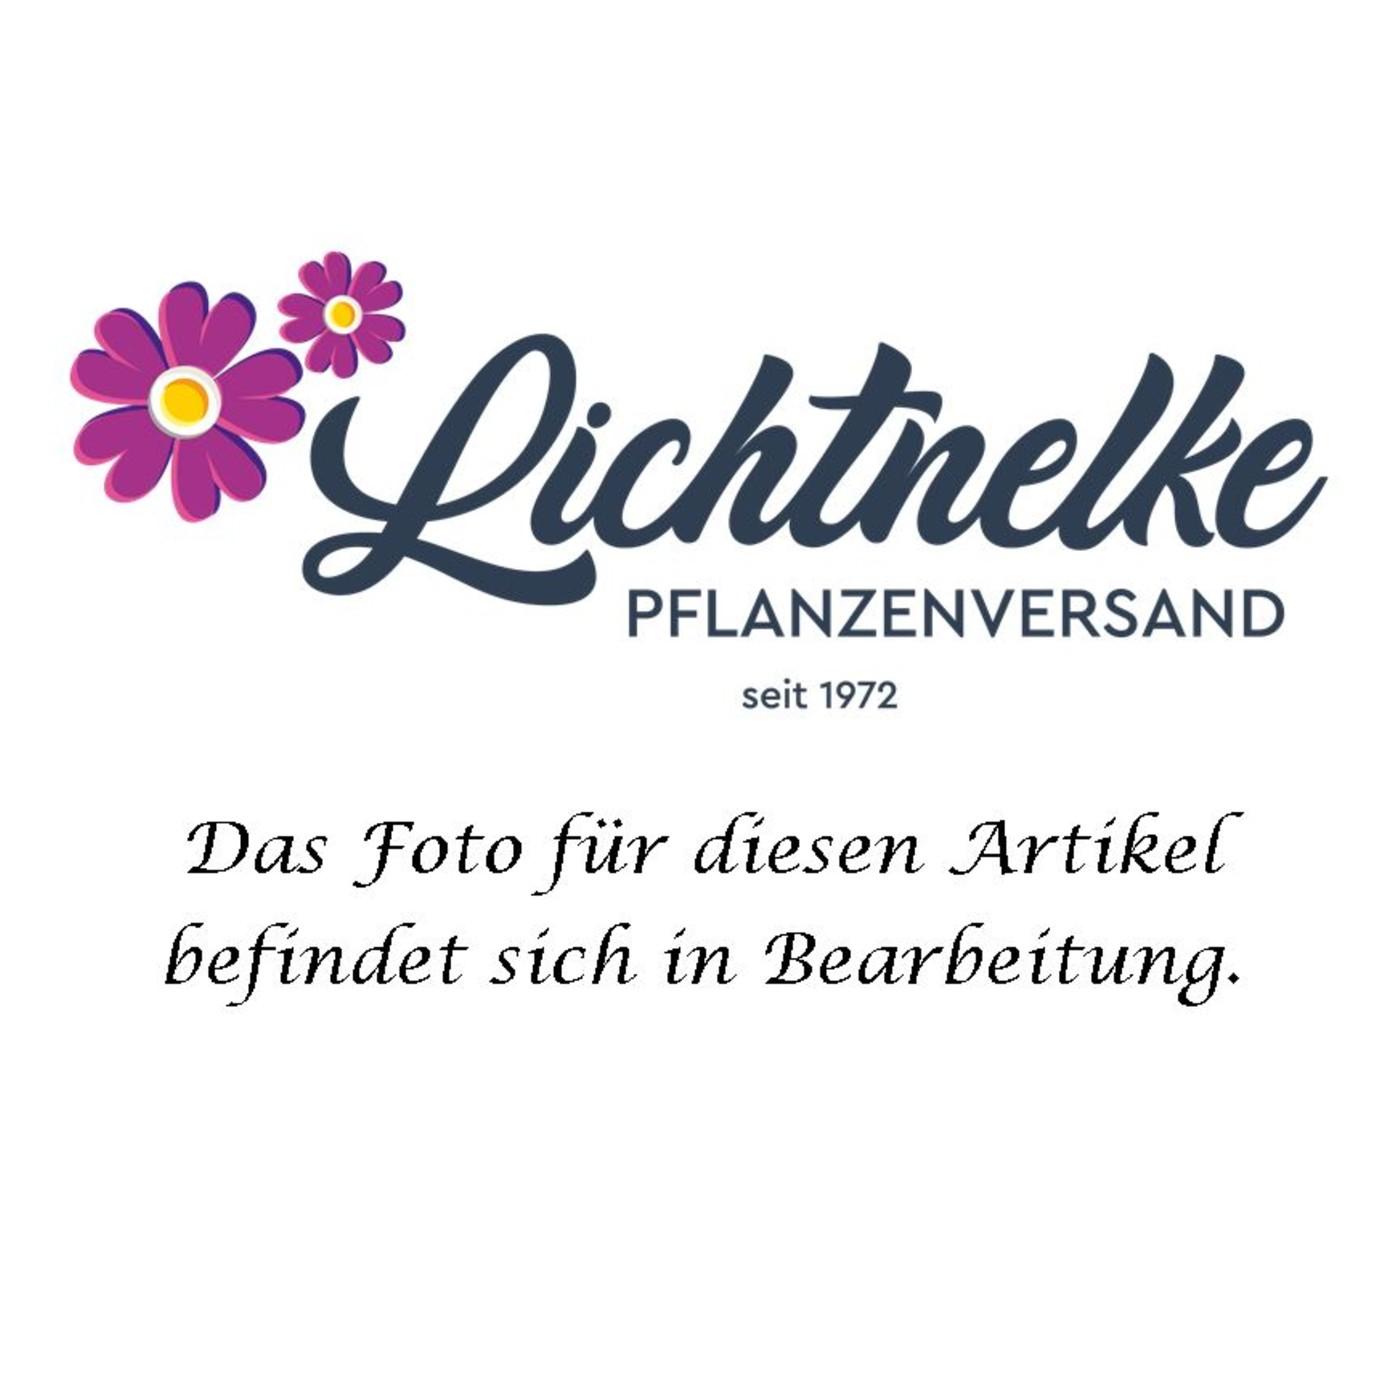 Duftloses Johanniskraut (Hypericum inodorum) Rheingold